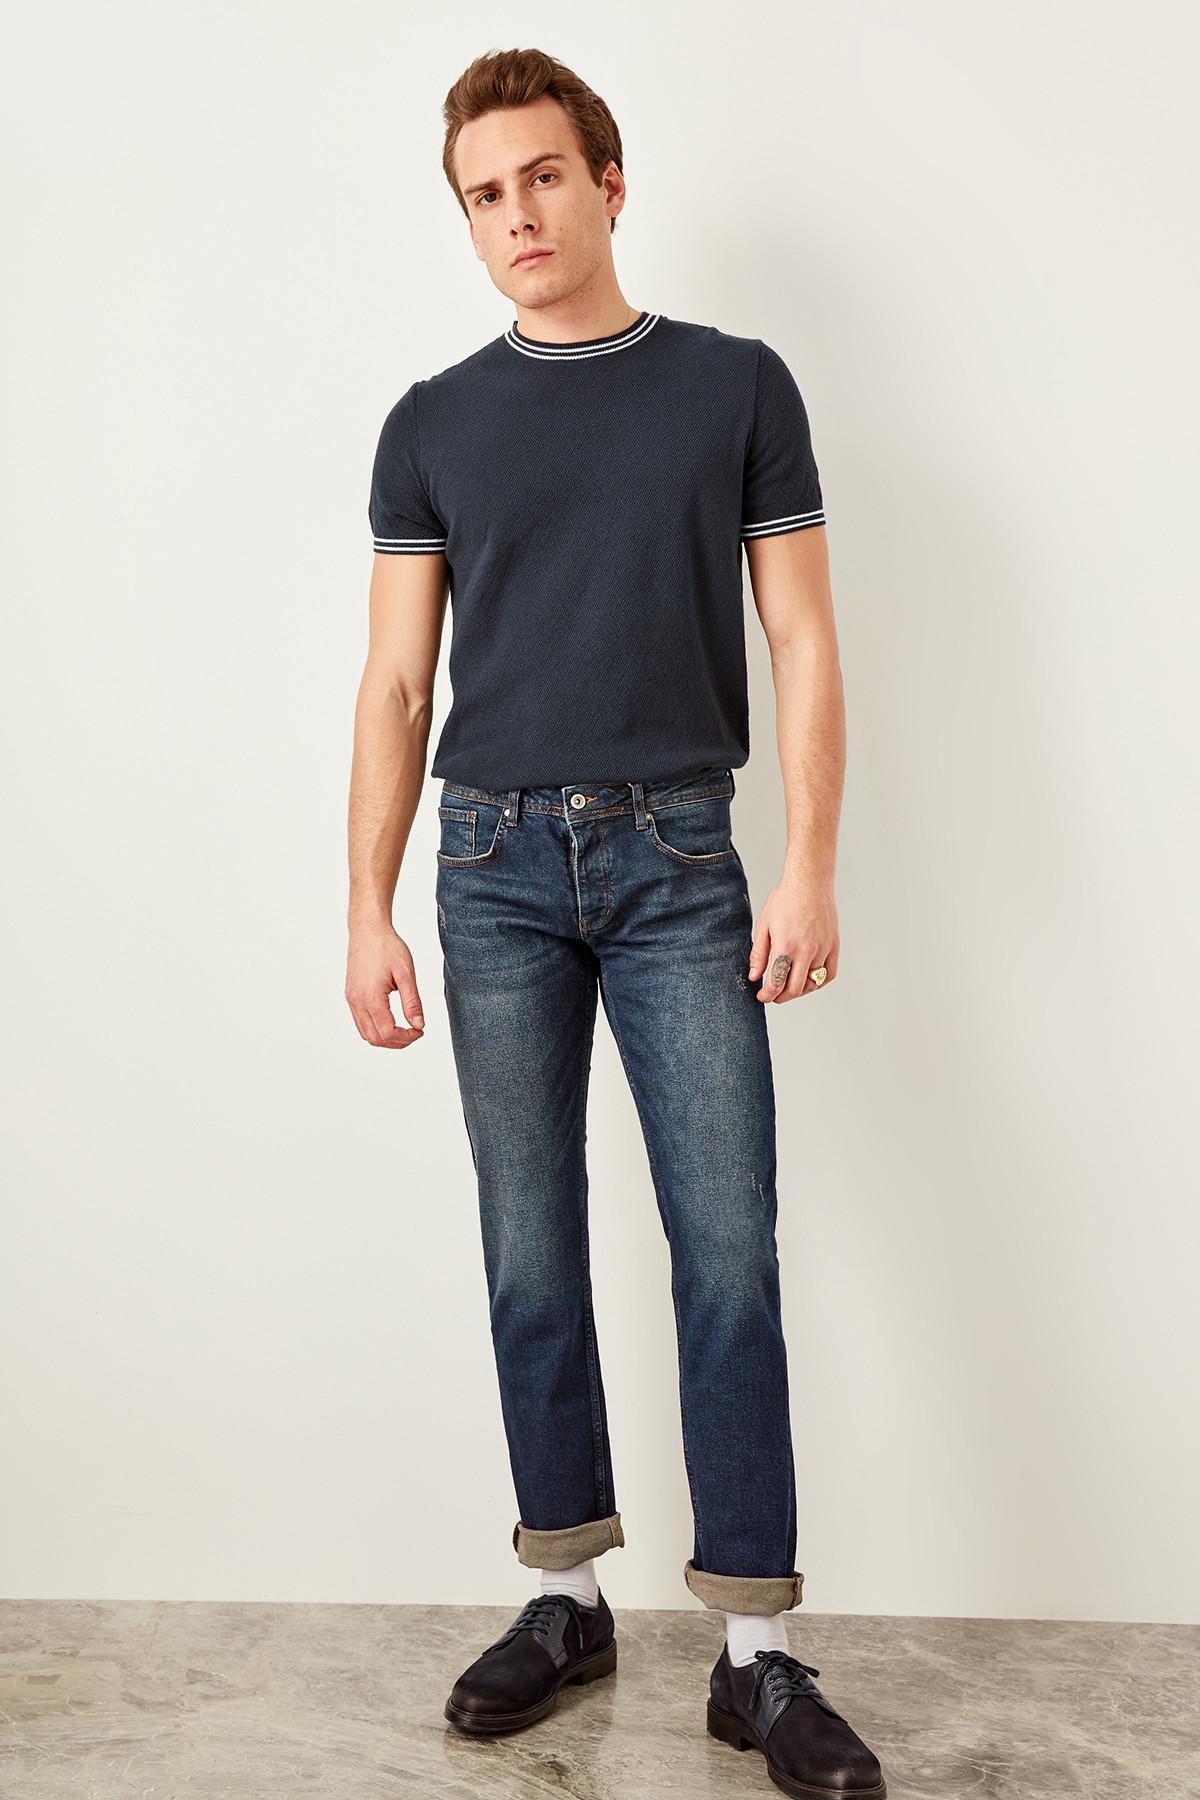 Trendyol Indigo Male Yıpratmalı Jeans-Flexible Fabric Slim Fit Denim Pants